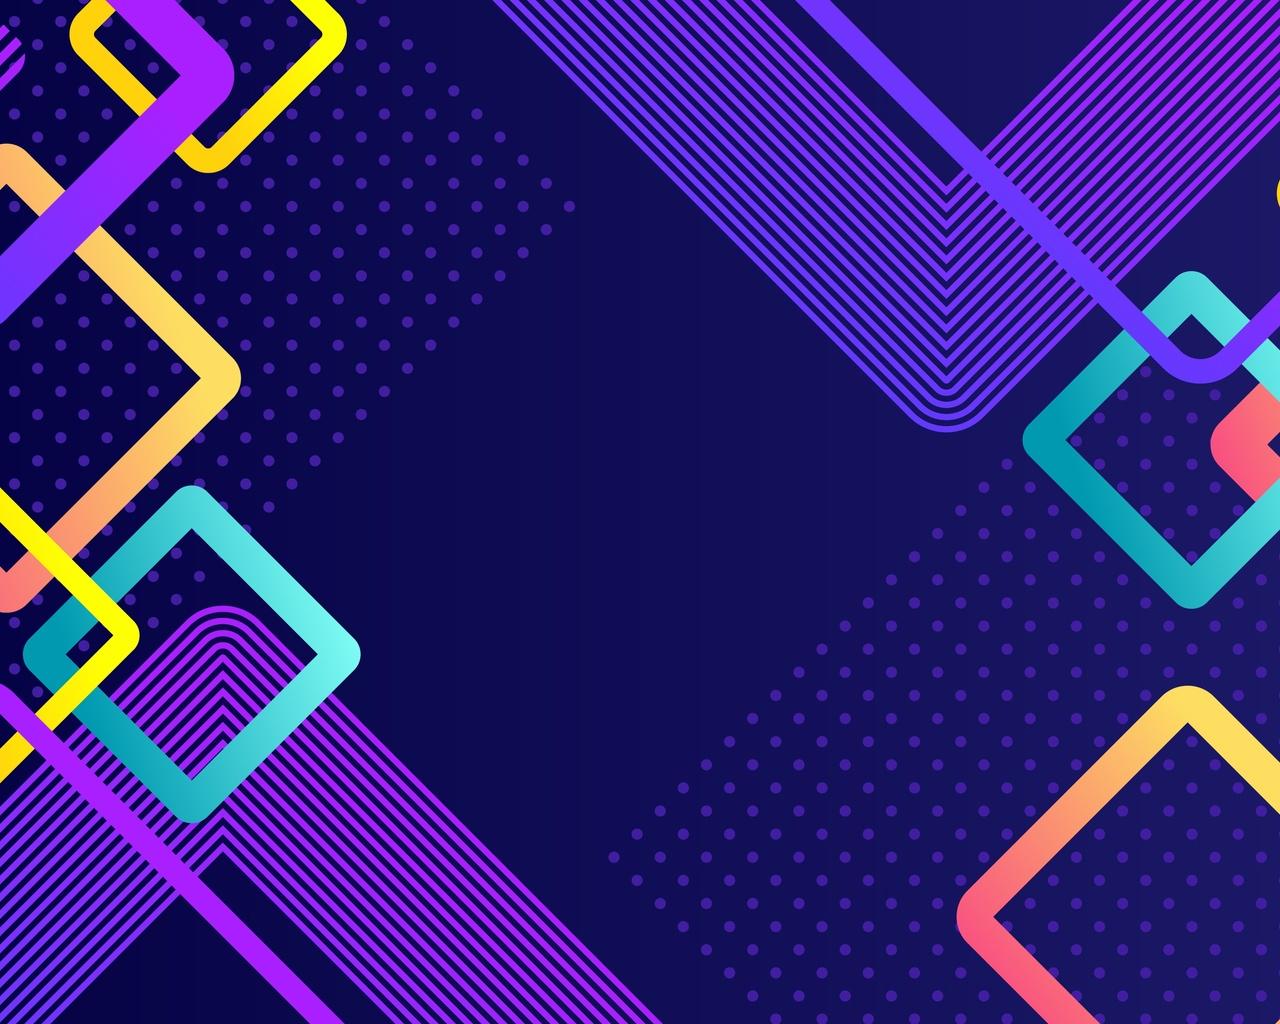 abstraction-vector-graphics-texture-jd.jpg